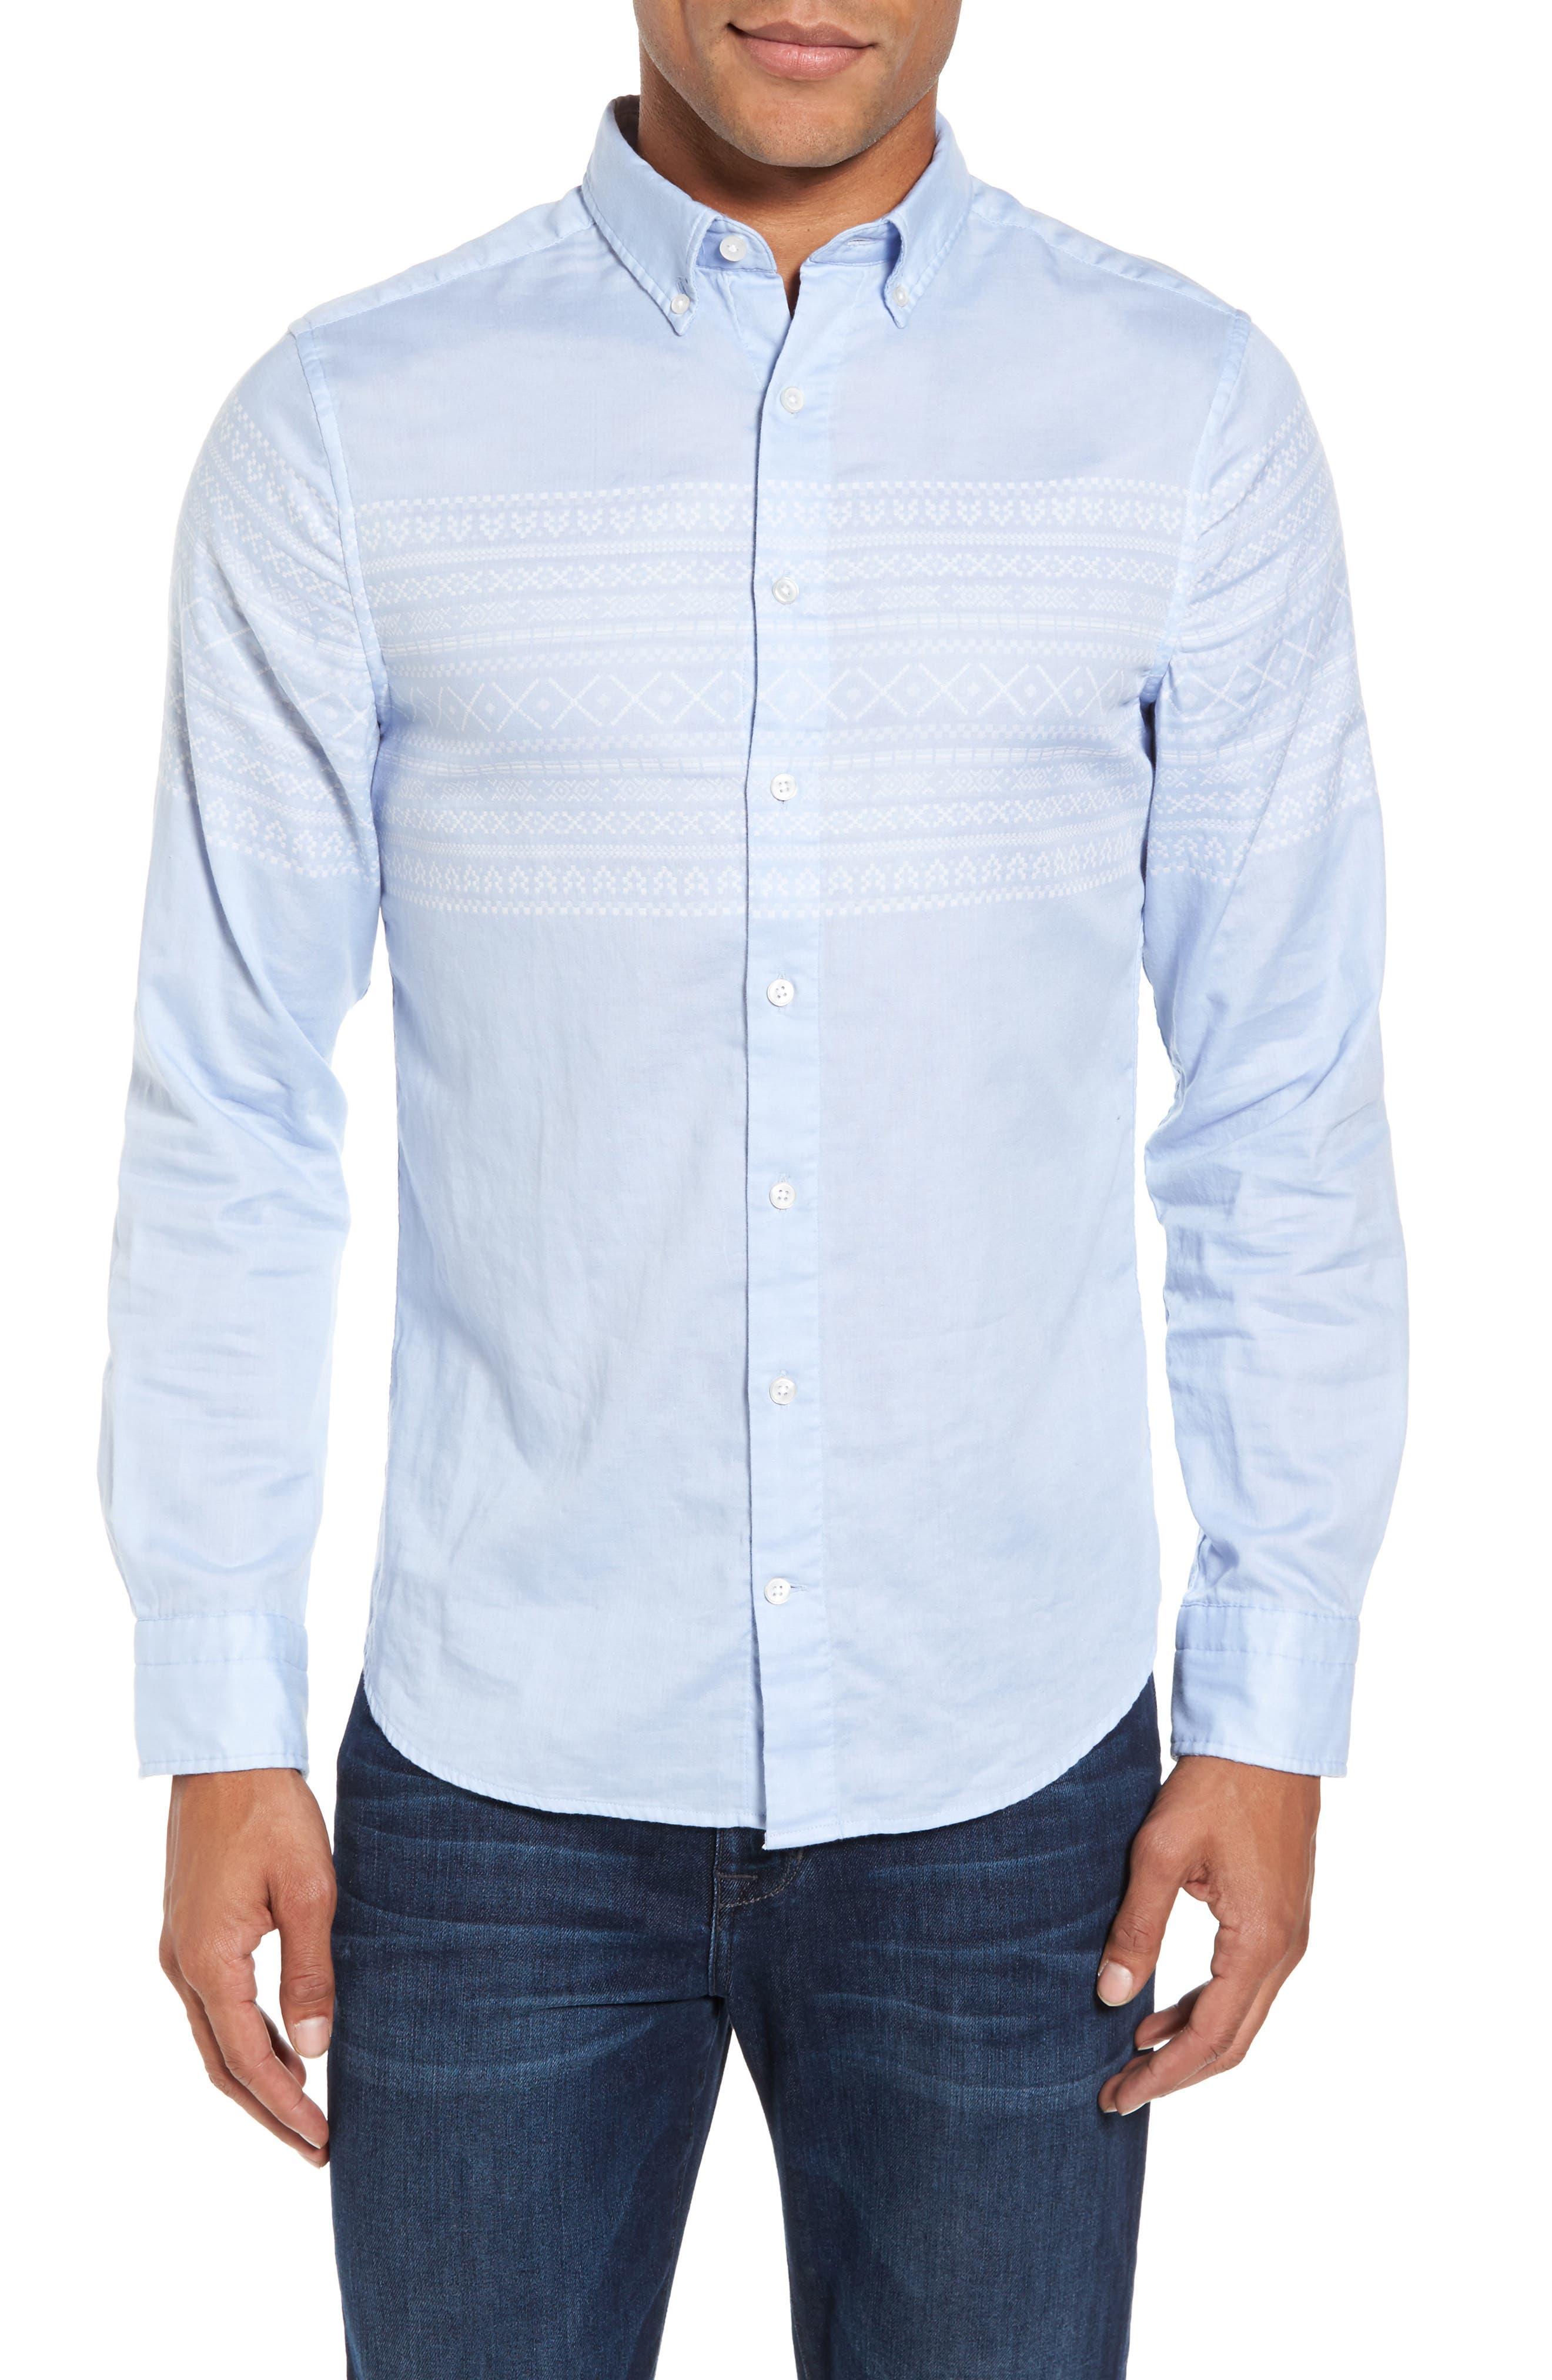 02 Extra Slim Fit Fair Isle Print Sport Shirt,                             Main thumbnail 1, color,                             Hamptons Blue